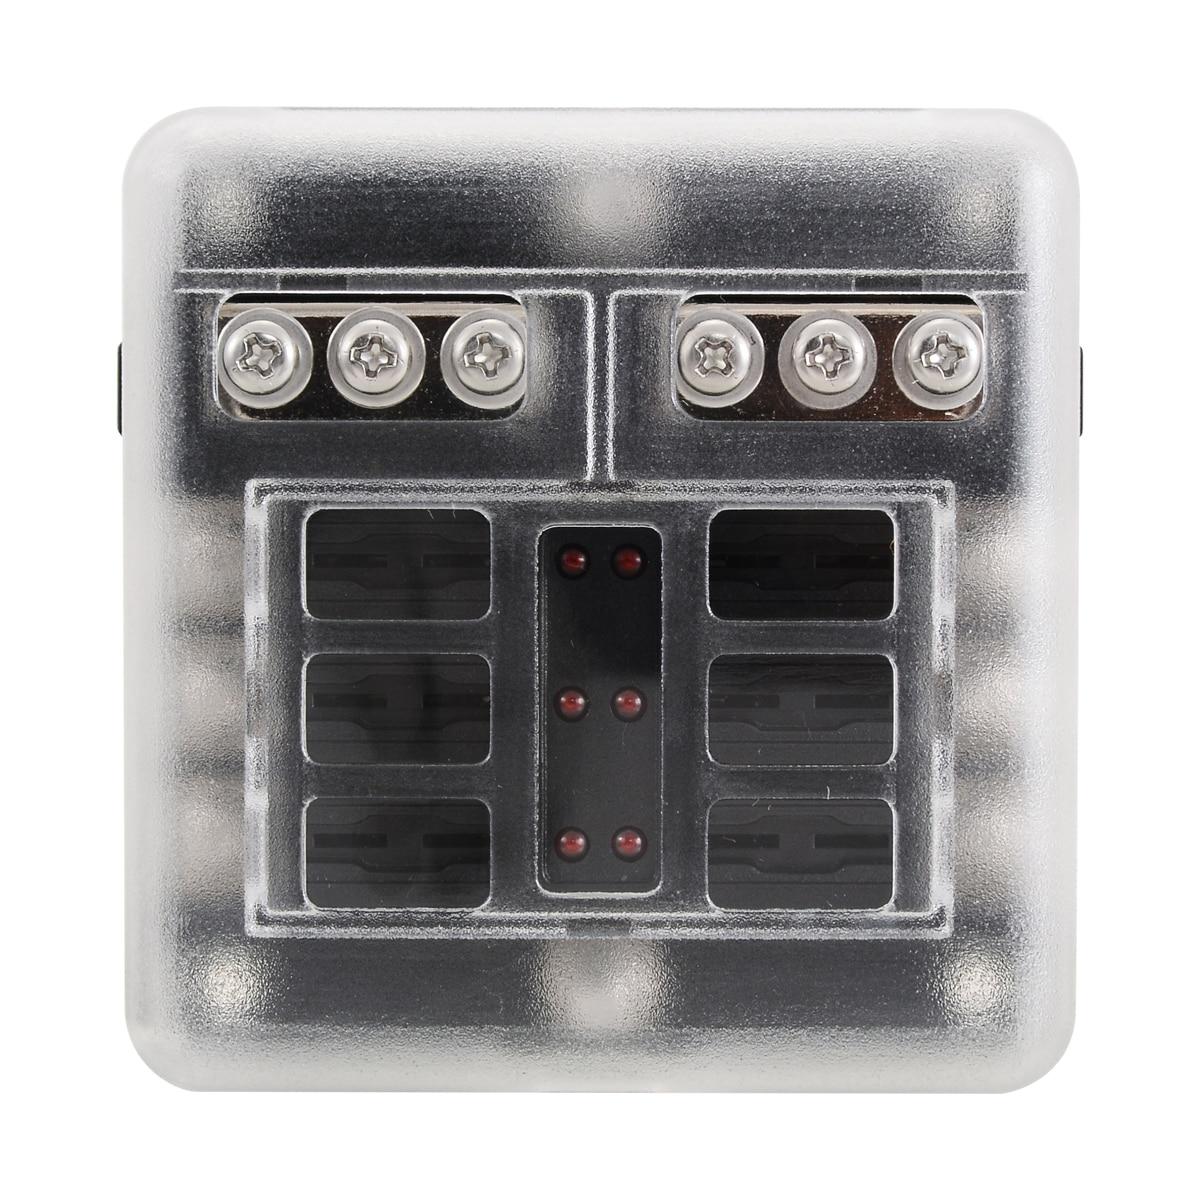 12V 24V Plastic Cover Fuse Box Holder 6 Way Blade Fuse Block Case With LED Indicator Display for Car Truck Marine Bus RV Van